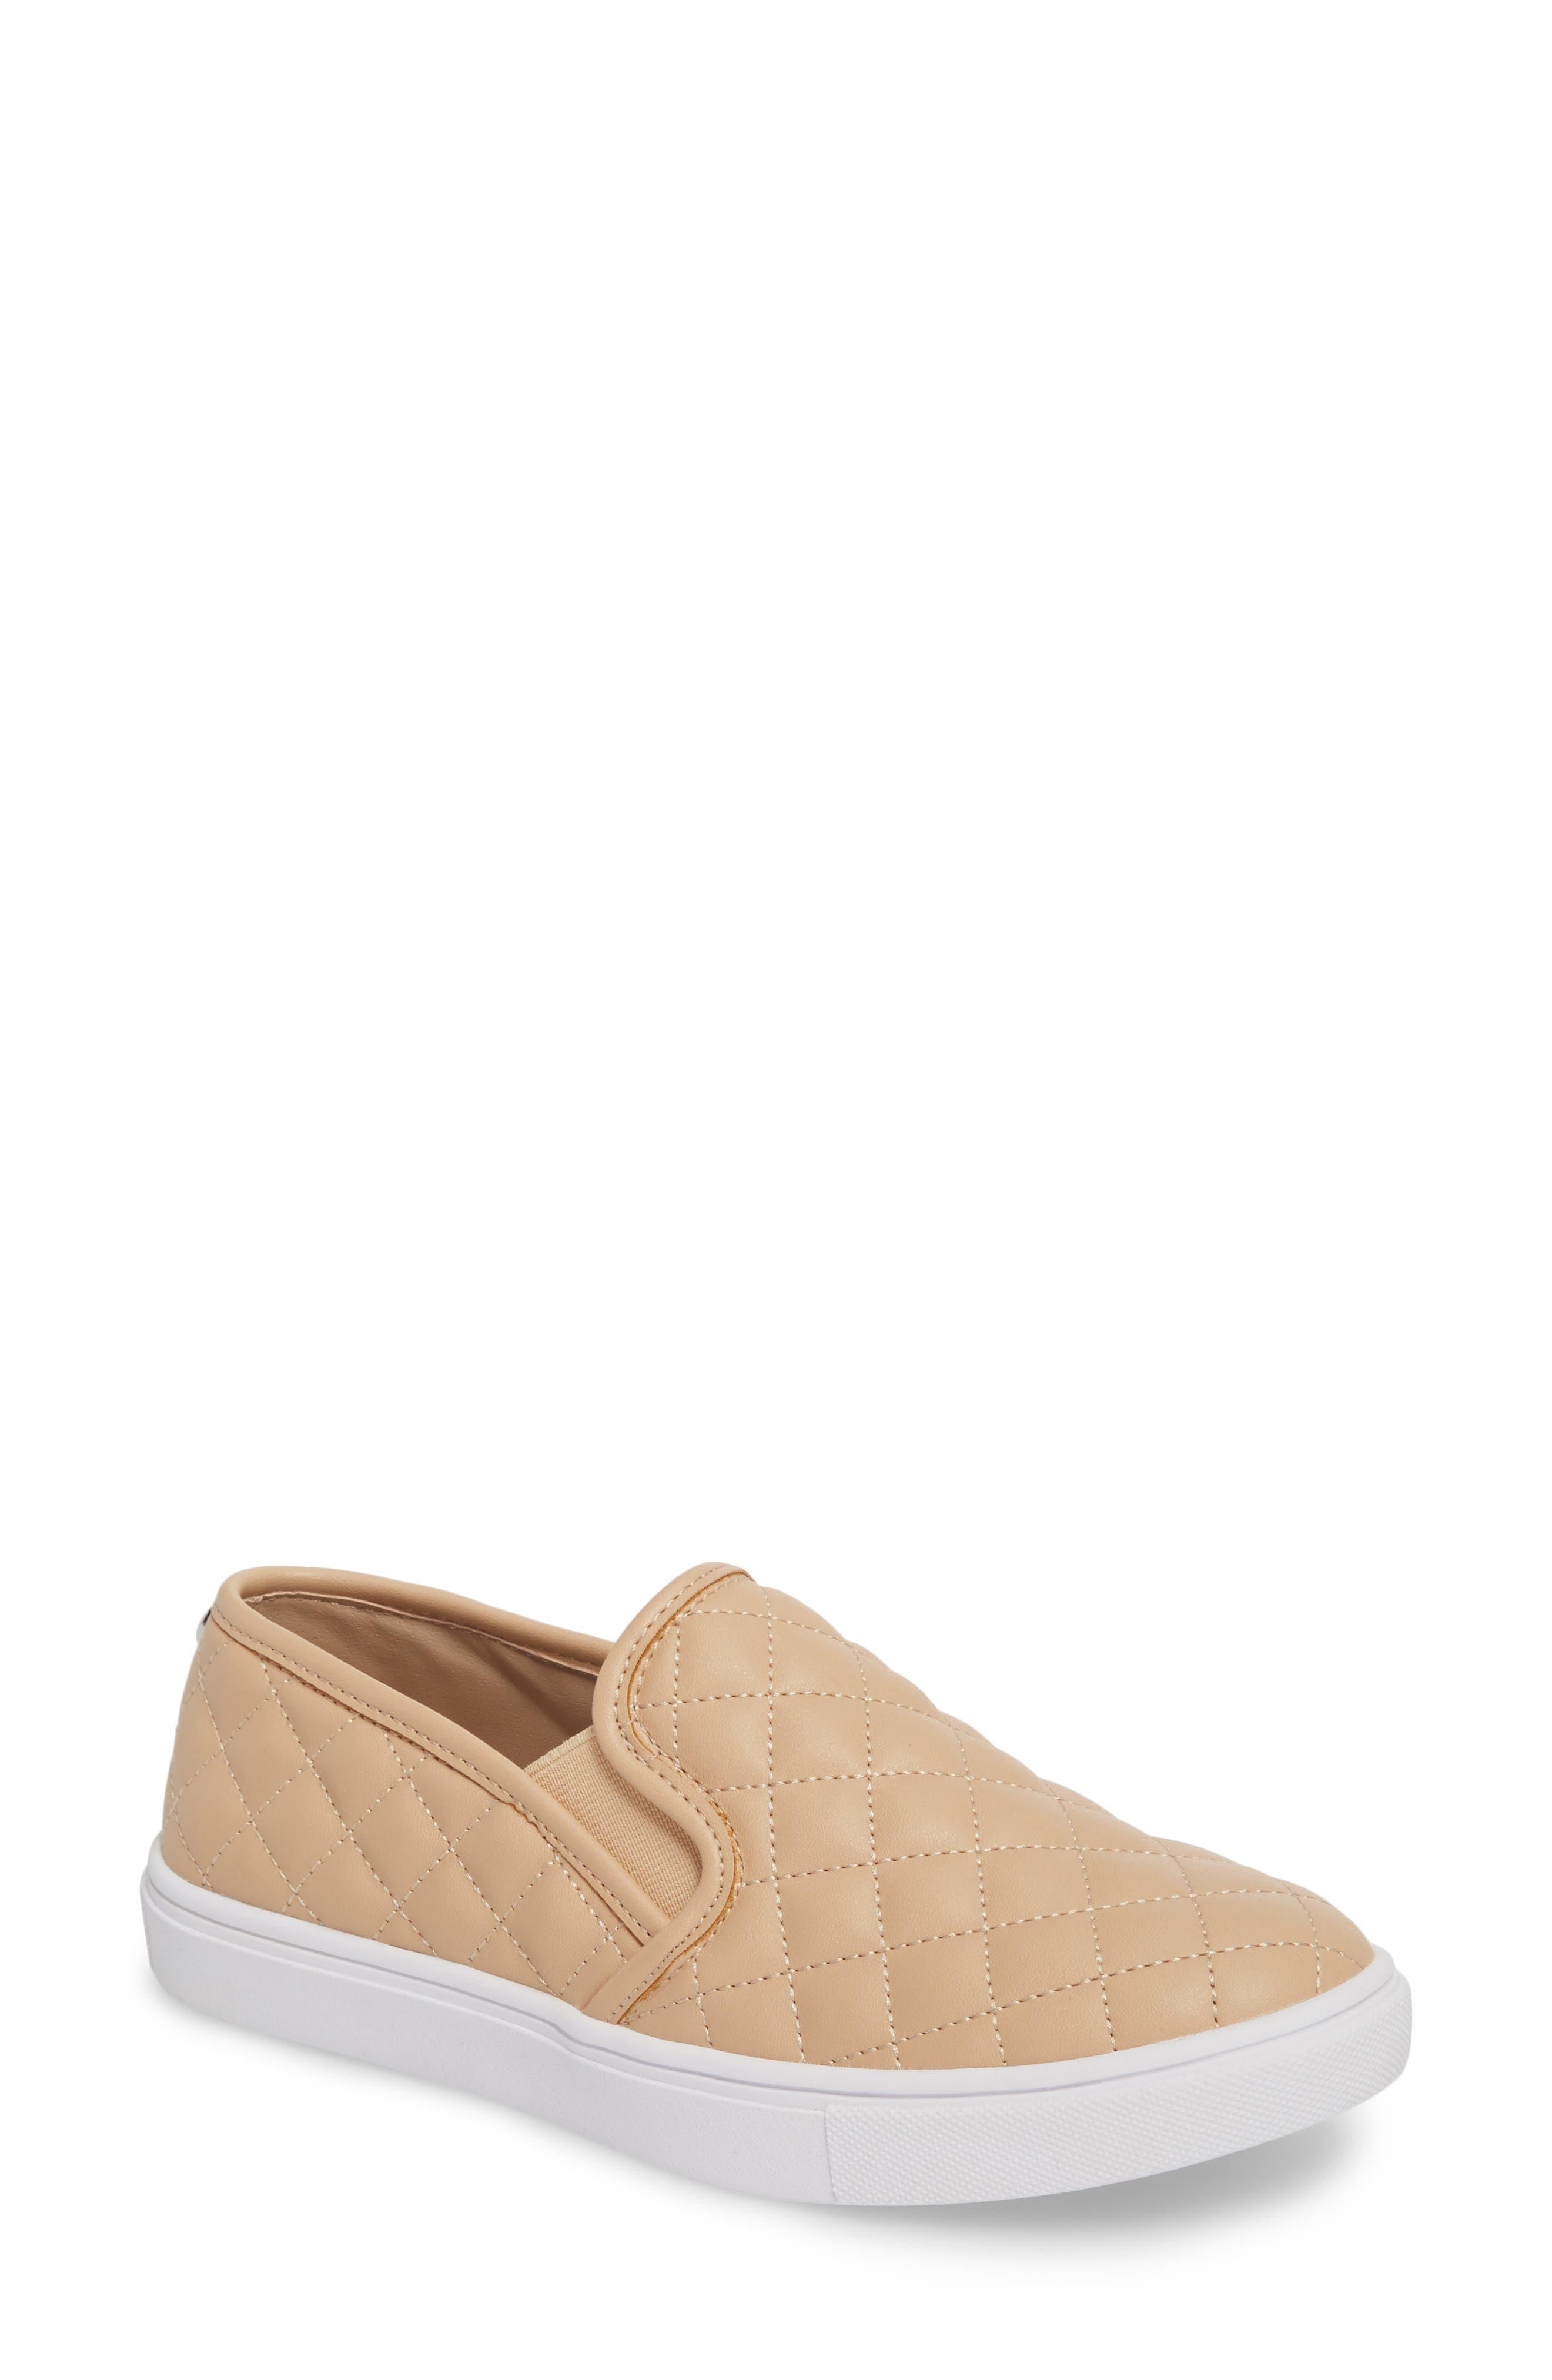 Ecentrcq Sneaker, Main, color, 250